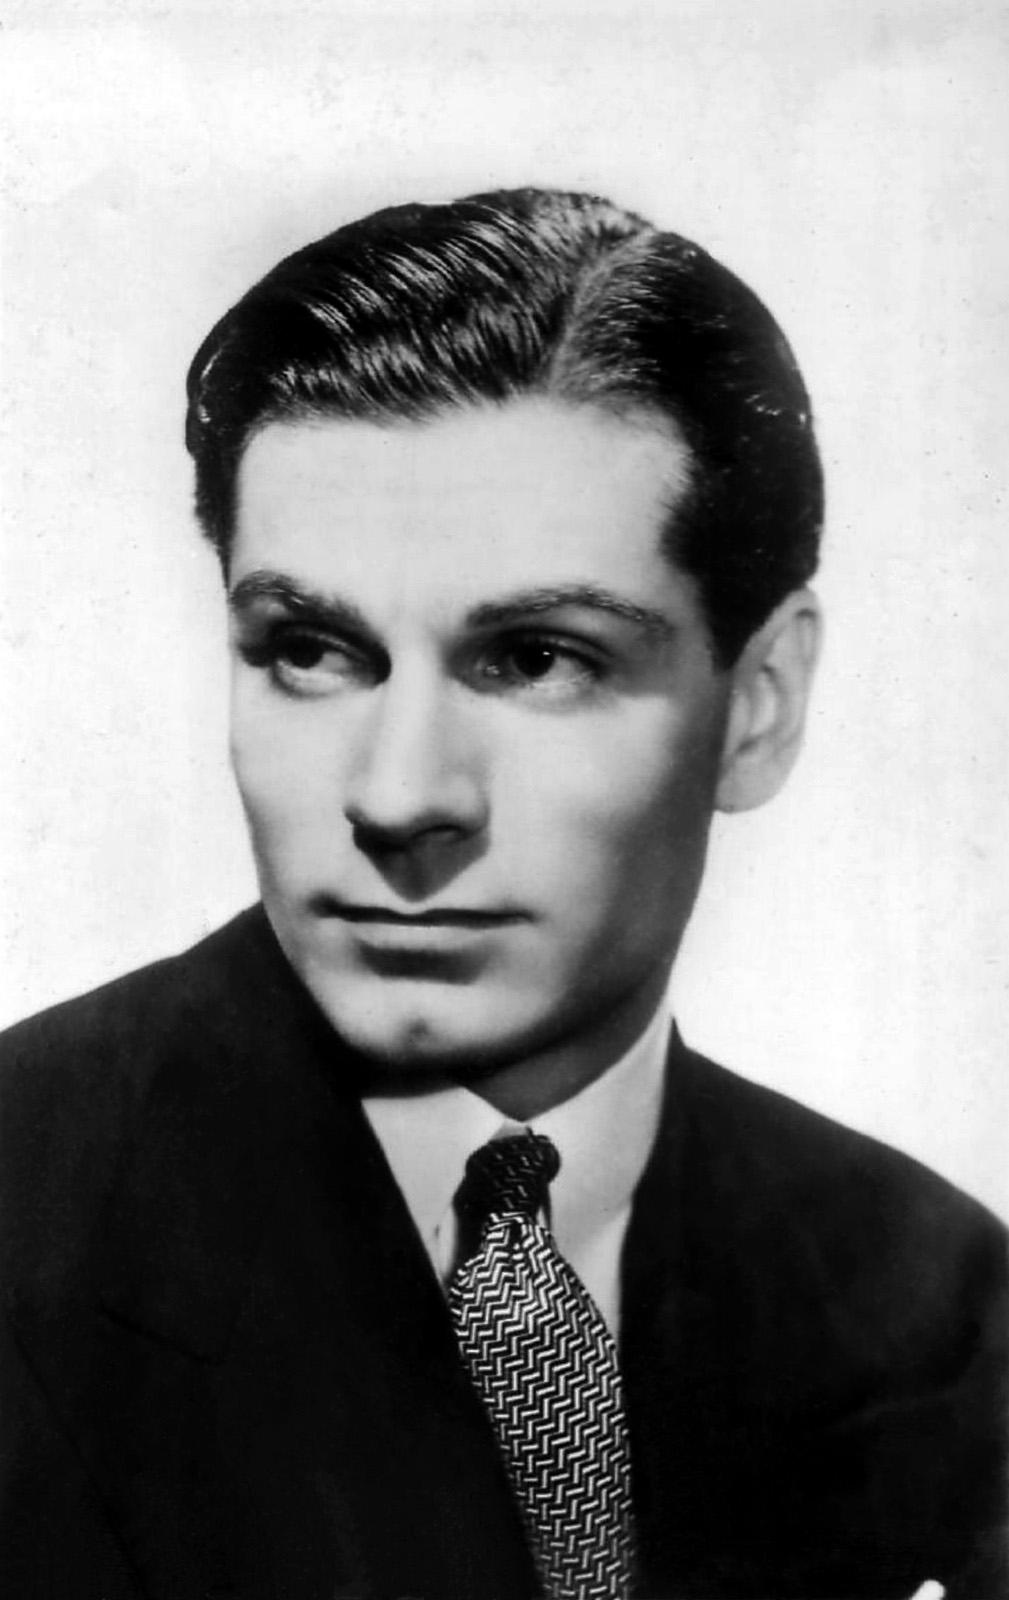 Laurence Olivier-NRFPT